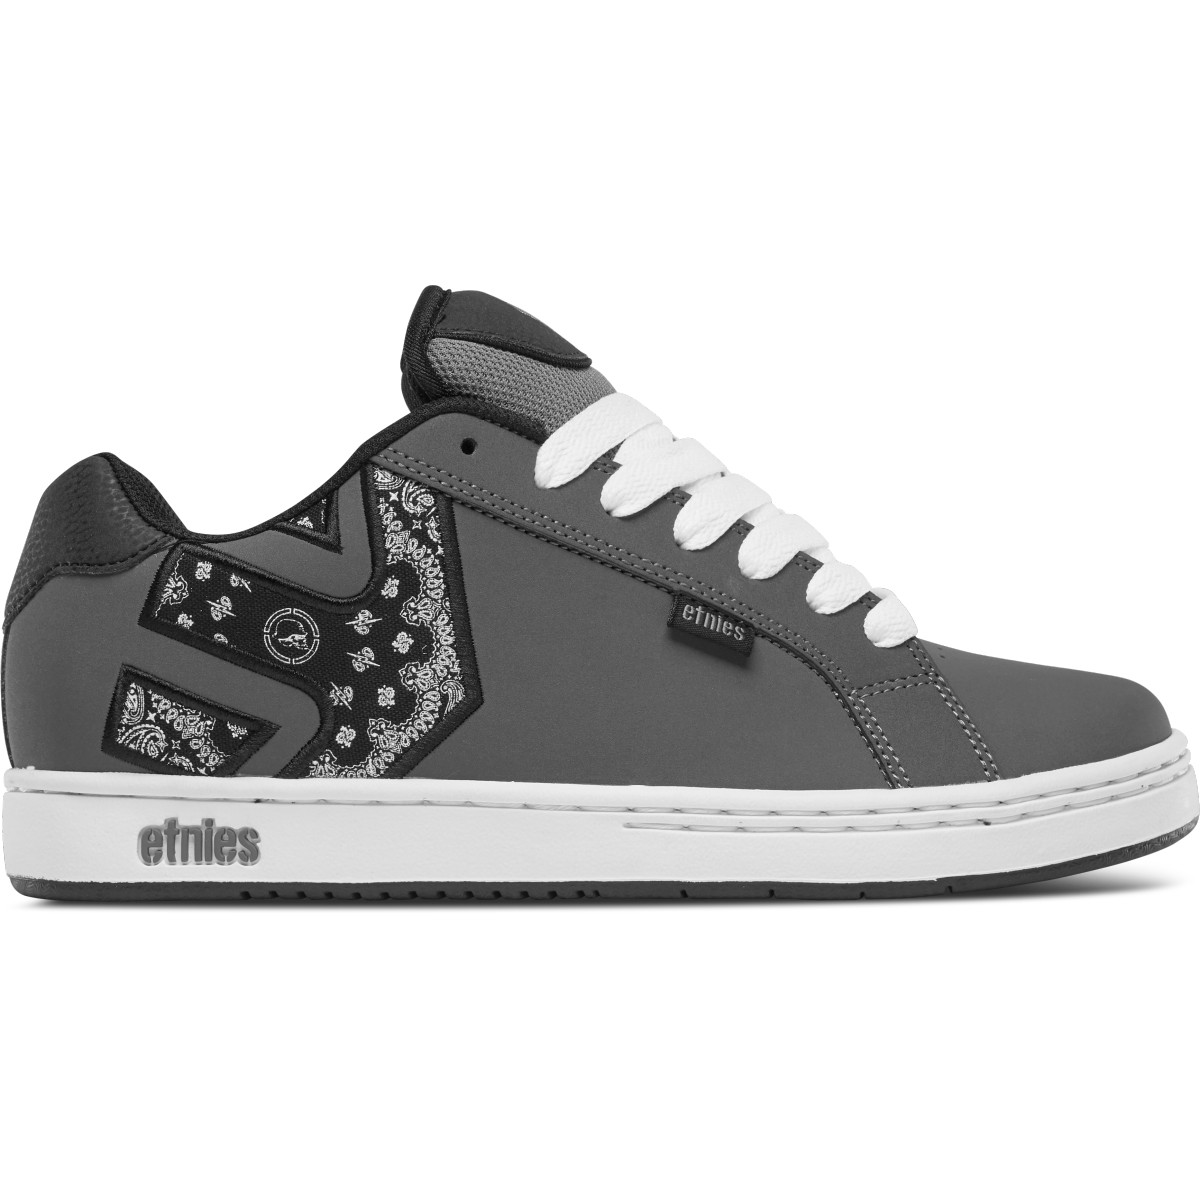 new arrivals limited price big collection Etnies Shoes Metal Mulisha Fader Dark Grey/Black/White